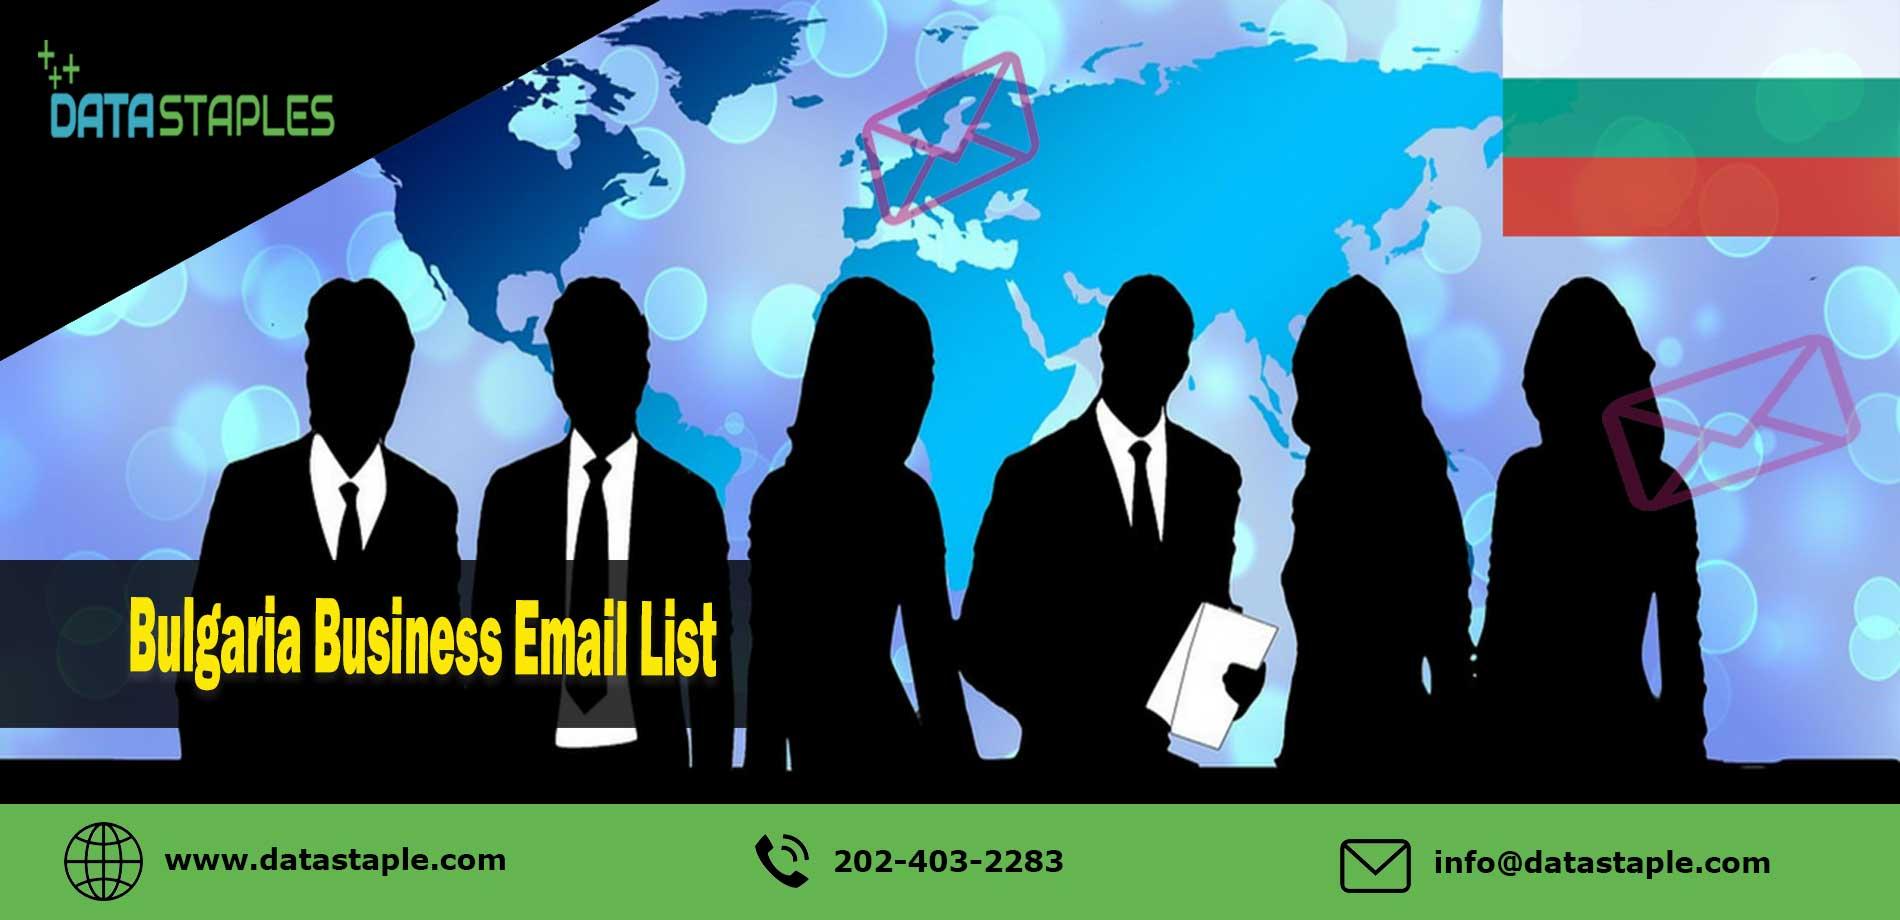 Bulgaria Business Email List   DataStaples